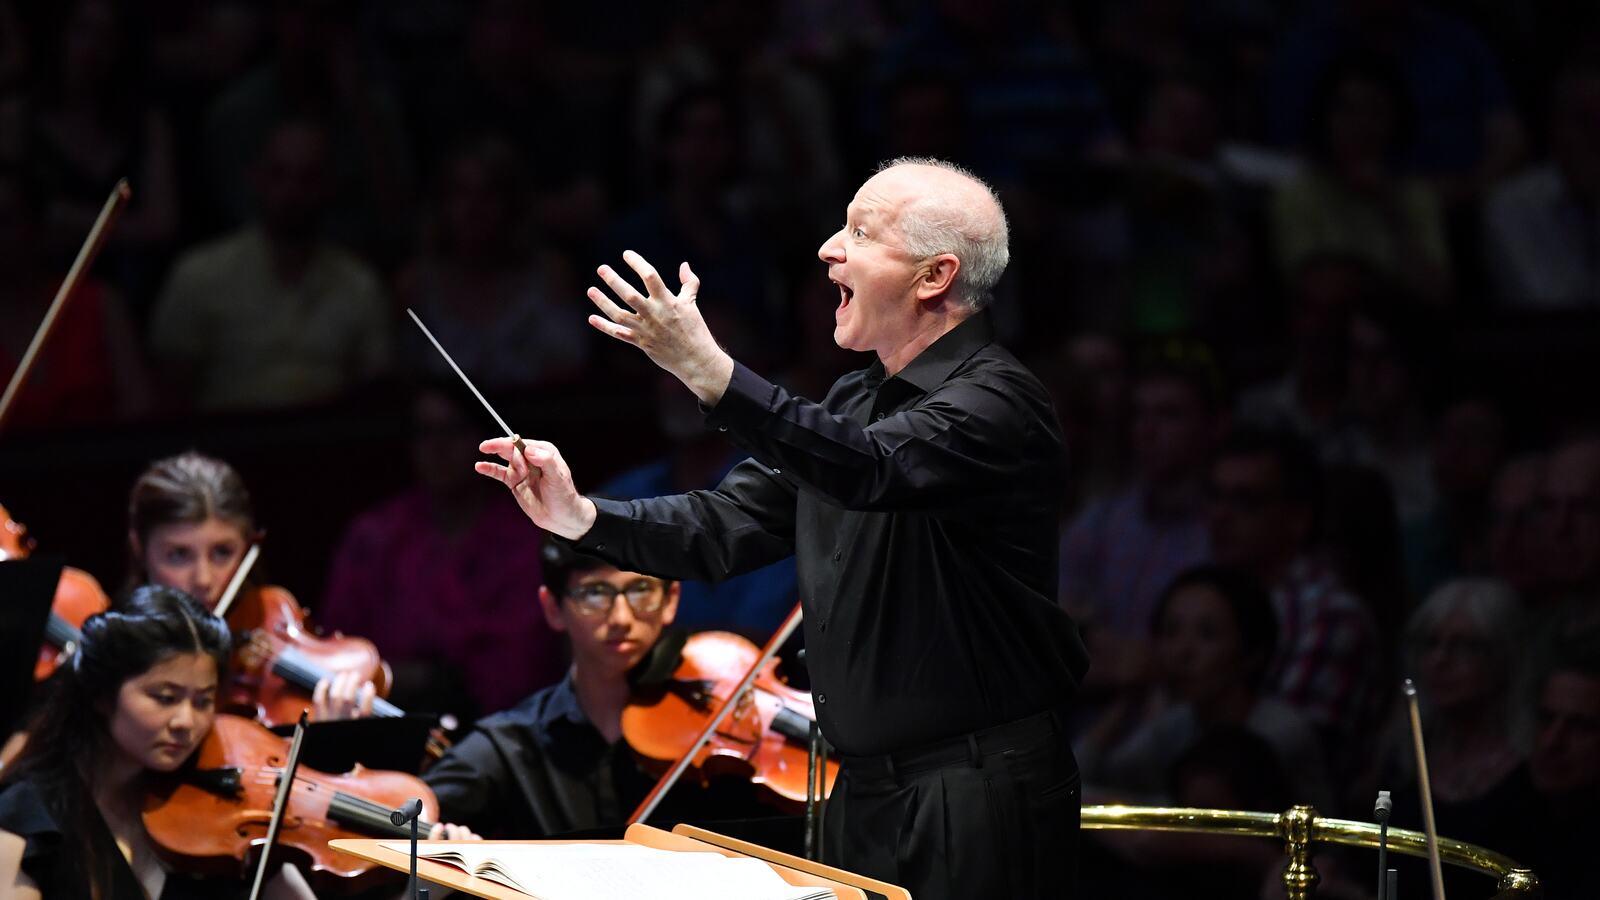 George Benjamin, conducting George Benjamin: A Duet and a Dream